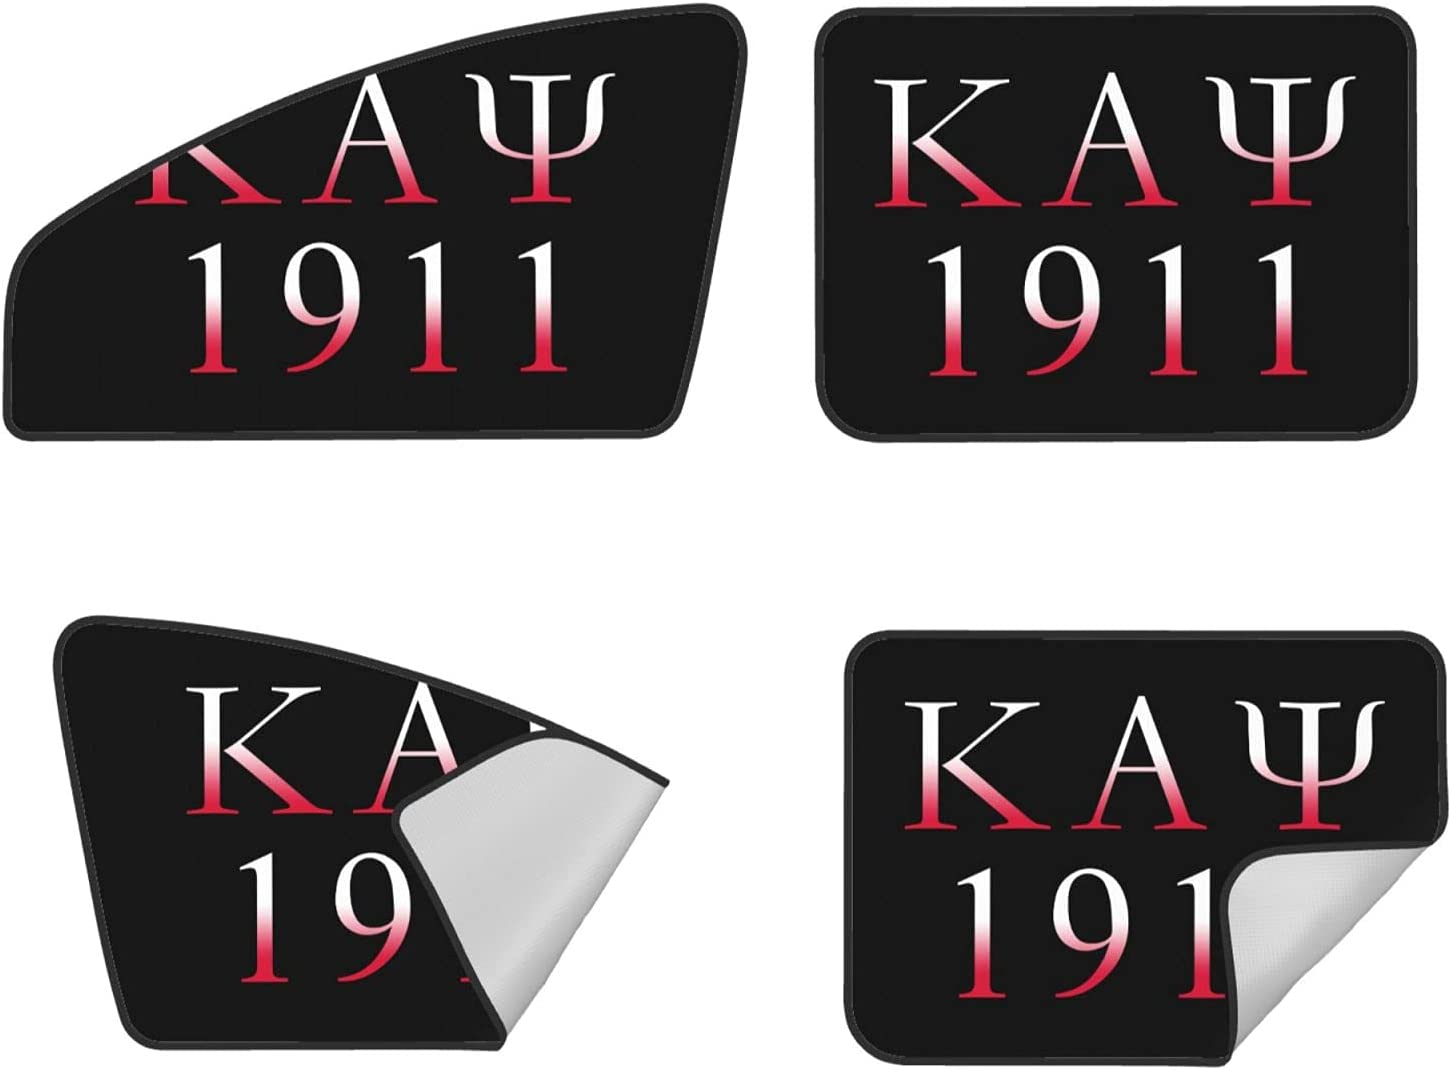 ZHUOBAIL Ka-pp_a A_lp-ha famous Ps-i security 1911 Nupes Visor Ca KAP Fraternity